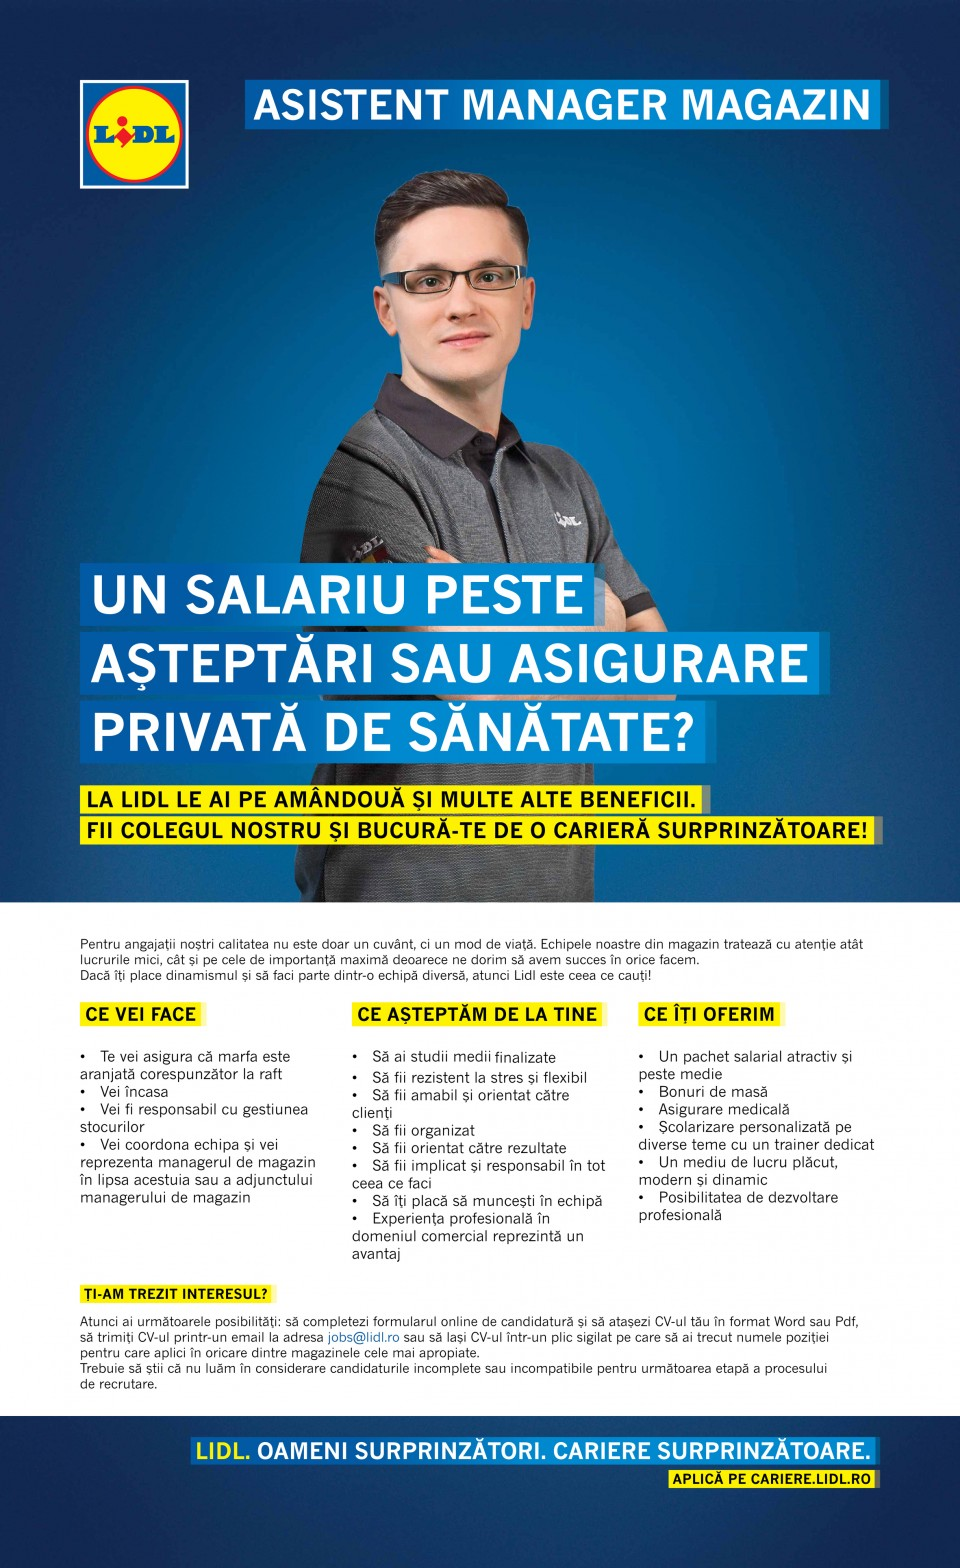 Asistent Manager Magazin - Slobozia  (f/m)